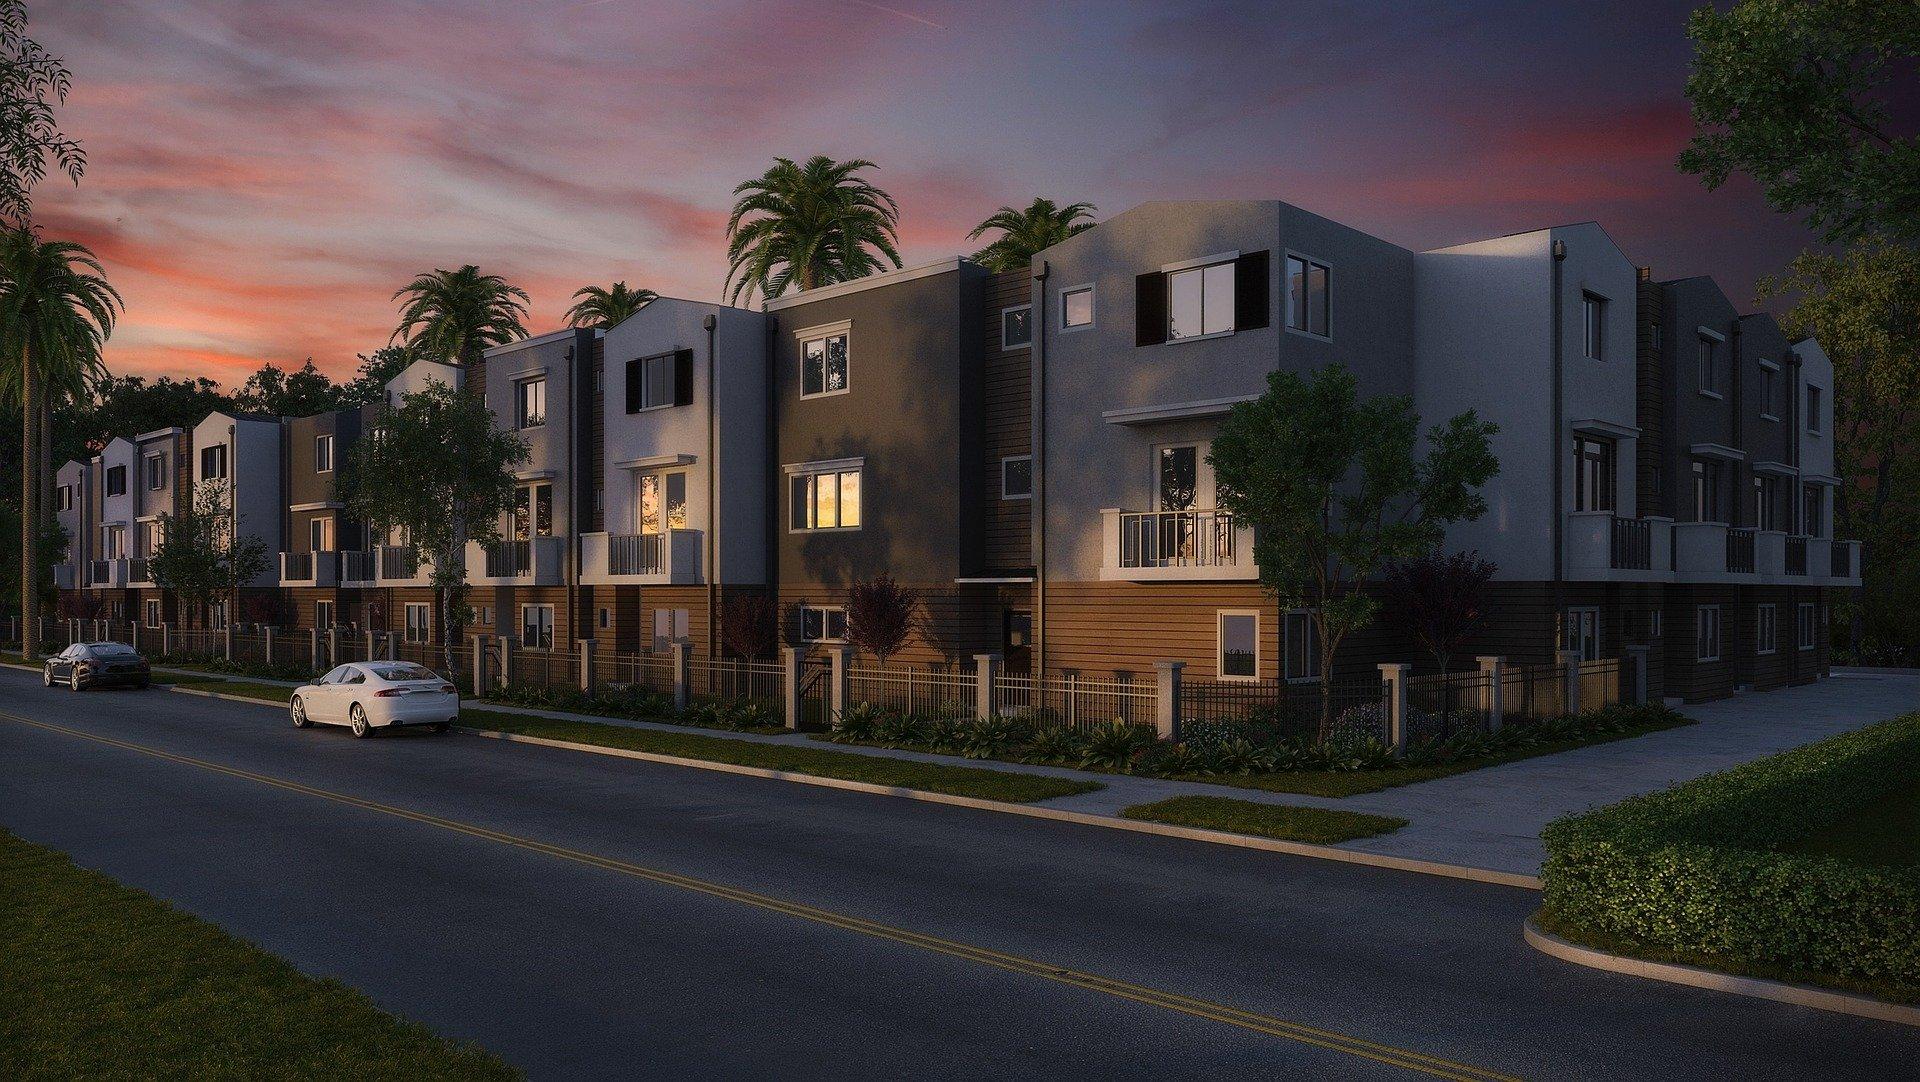 House of Botsford vs. Botsford Place Terrace Apartments